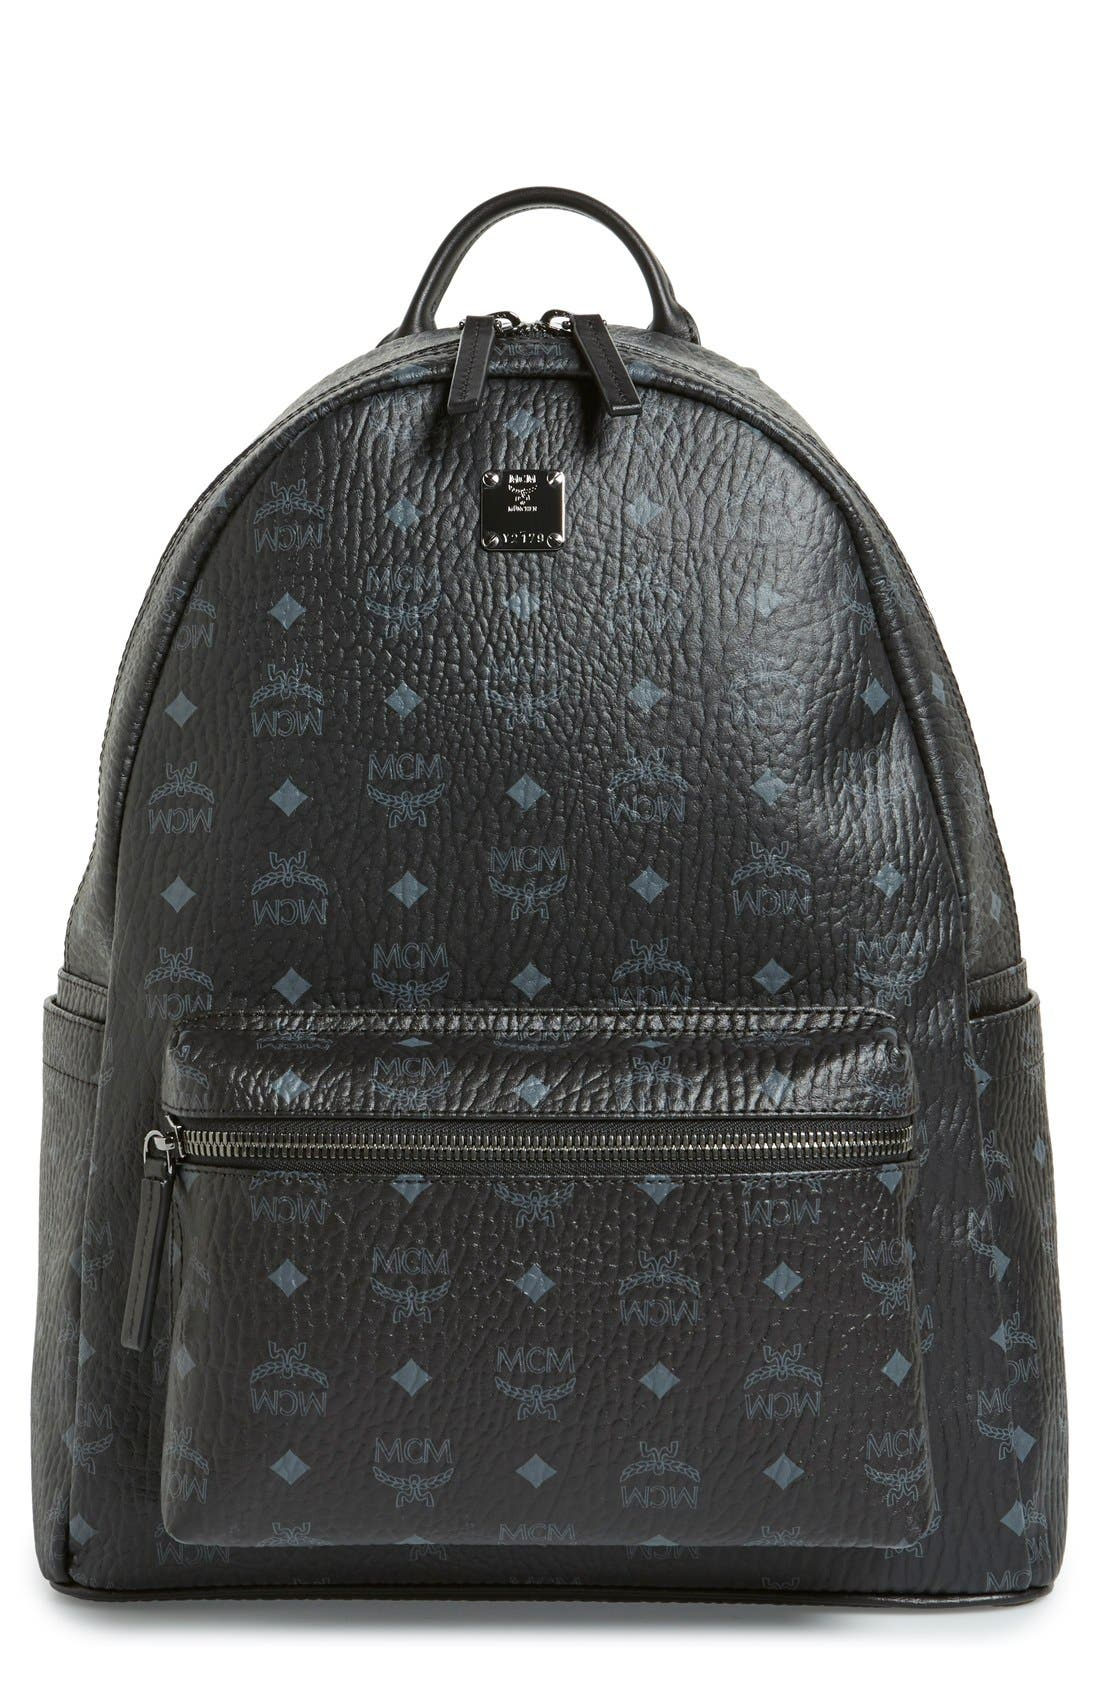 Medium Stark - Visetos Backpack,                             Main thumbnail 1, color,                             BLACK